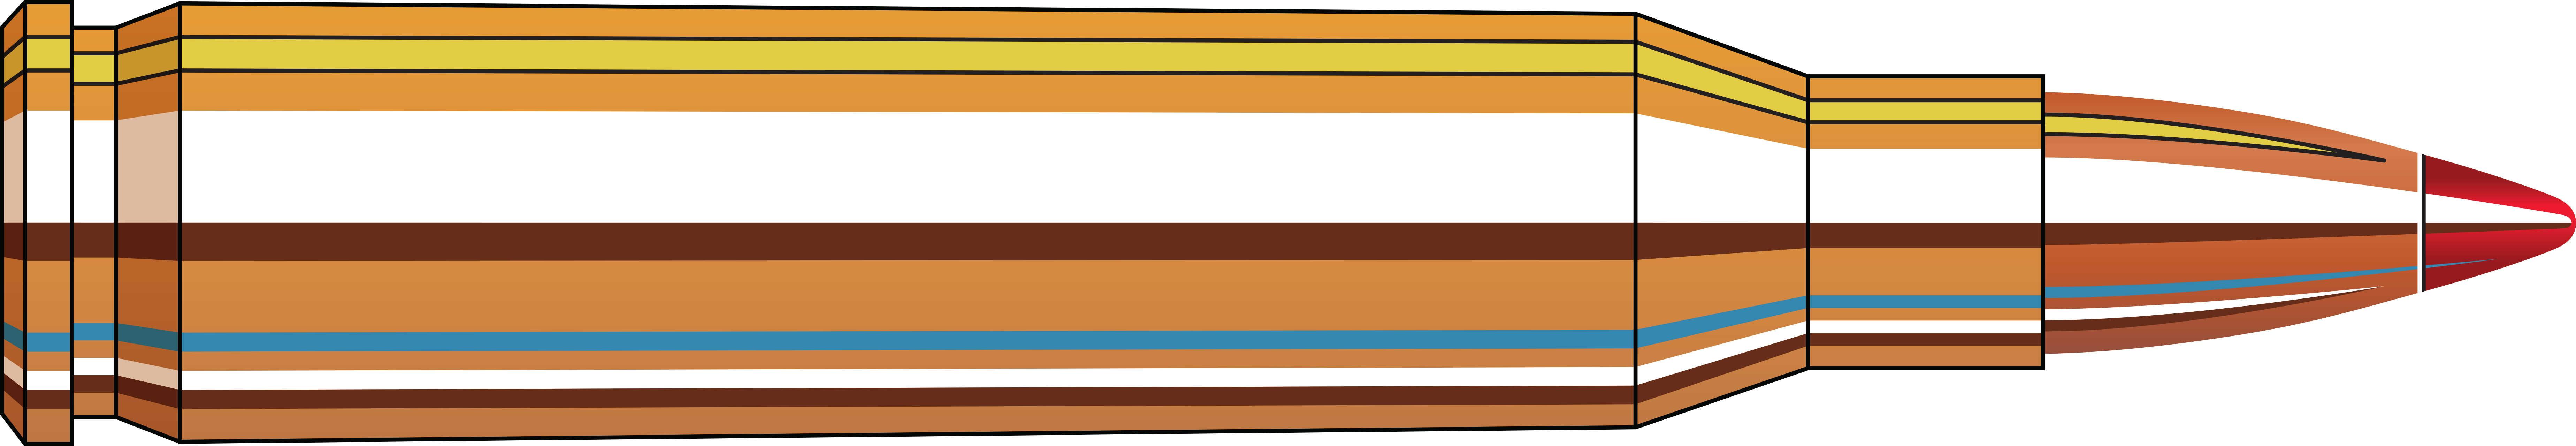 Hornady Superformance Varmint 223 Remington V-Max 53 Grain 20 Rounds 8025